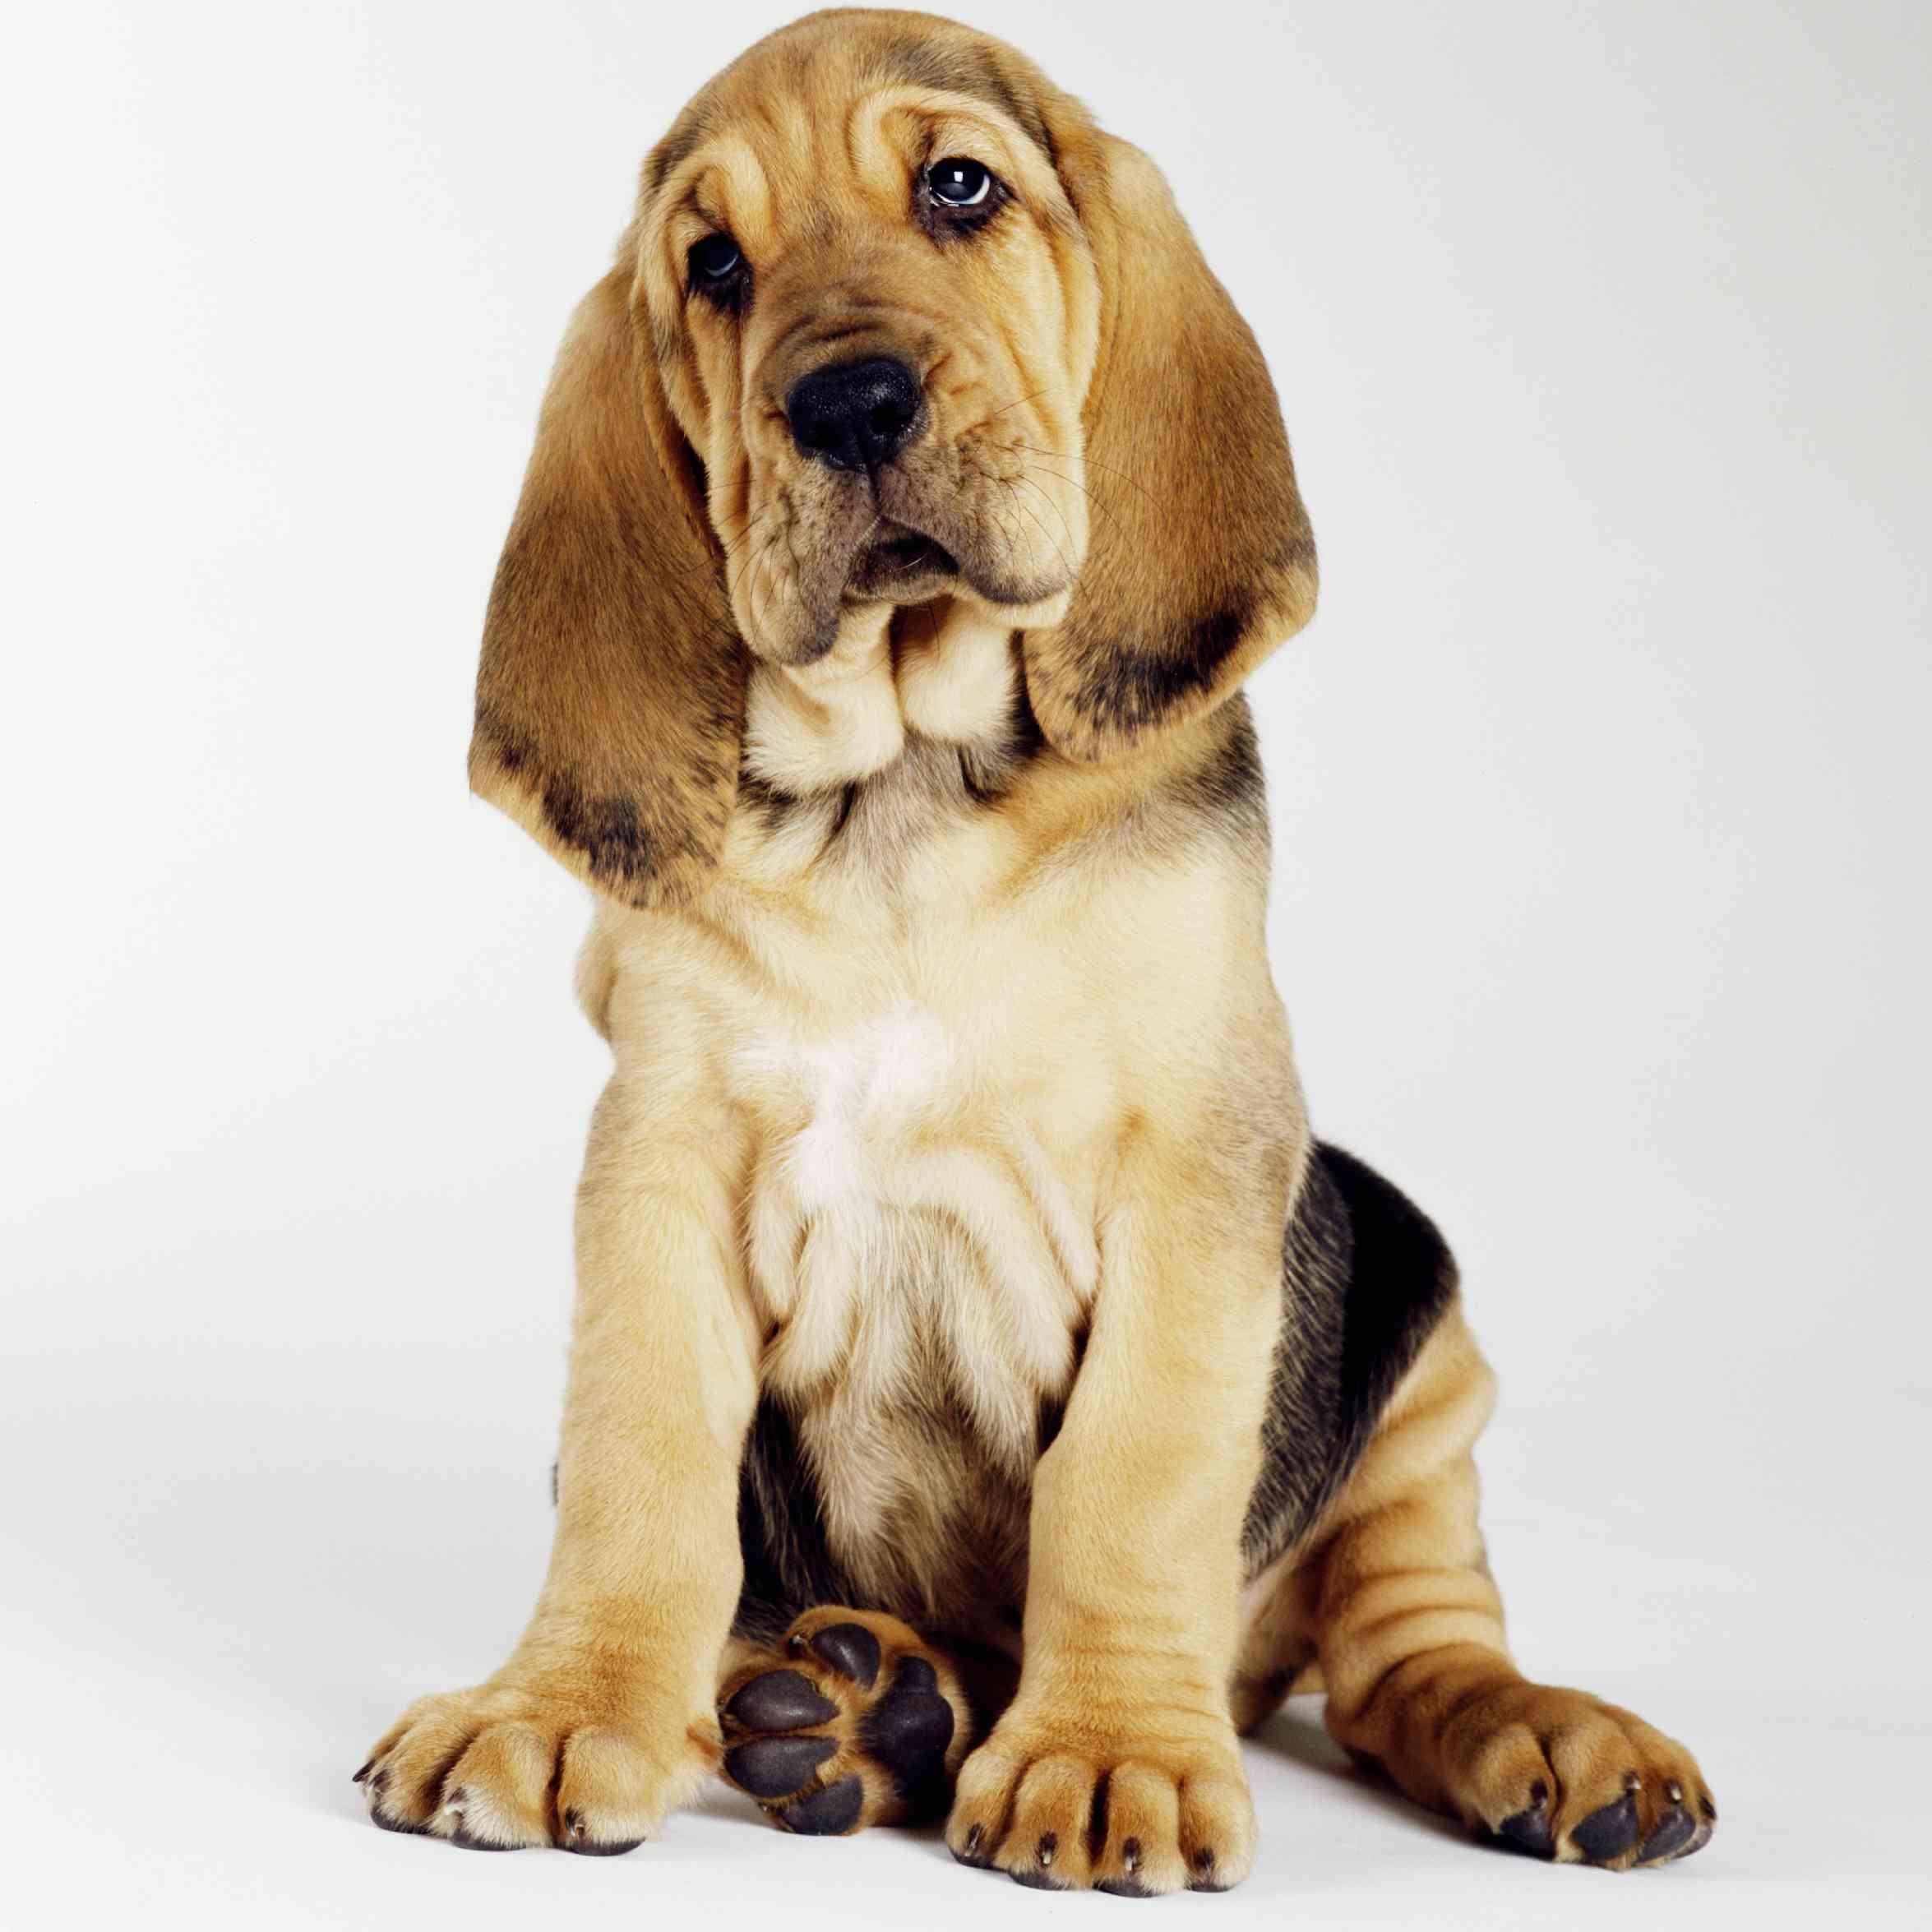 BloodhoundResize.jpg